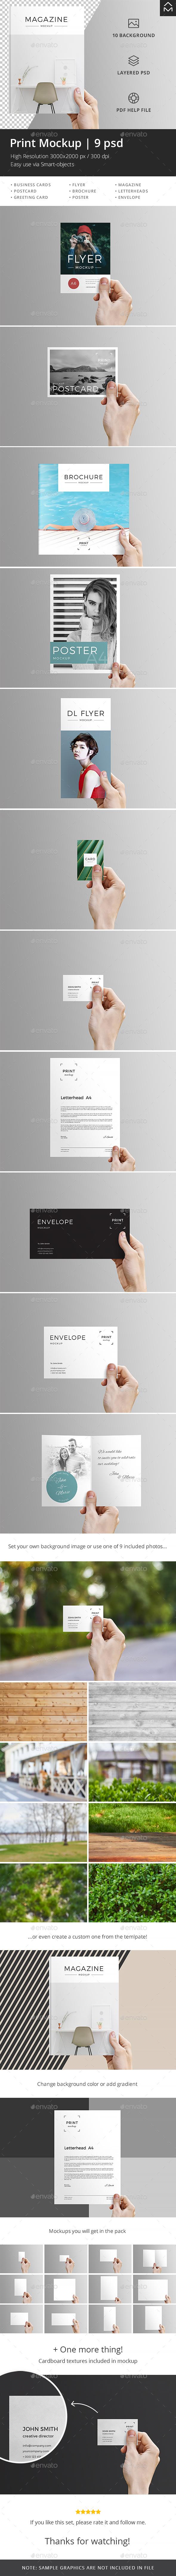 Print Mockup: Flyer, Magazine, Poster, Card - Print Product Mock-Ups